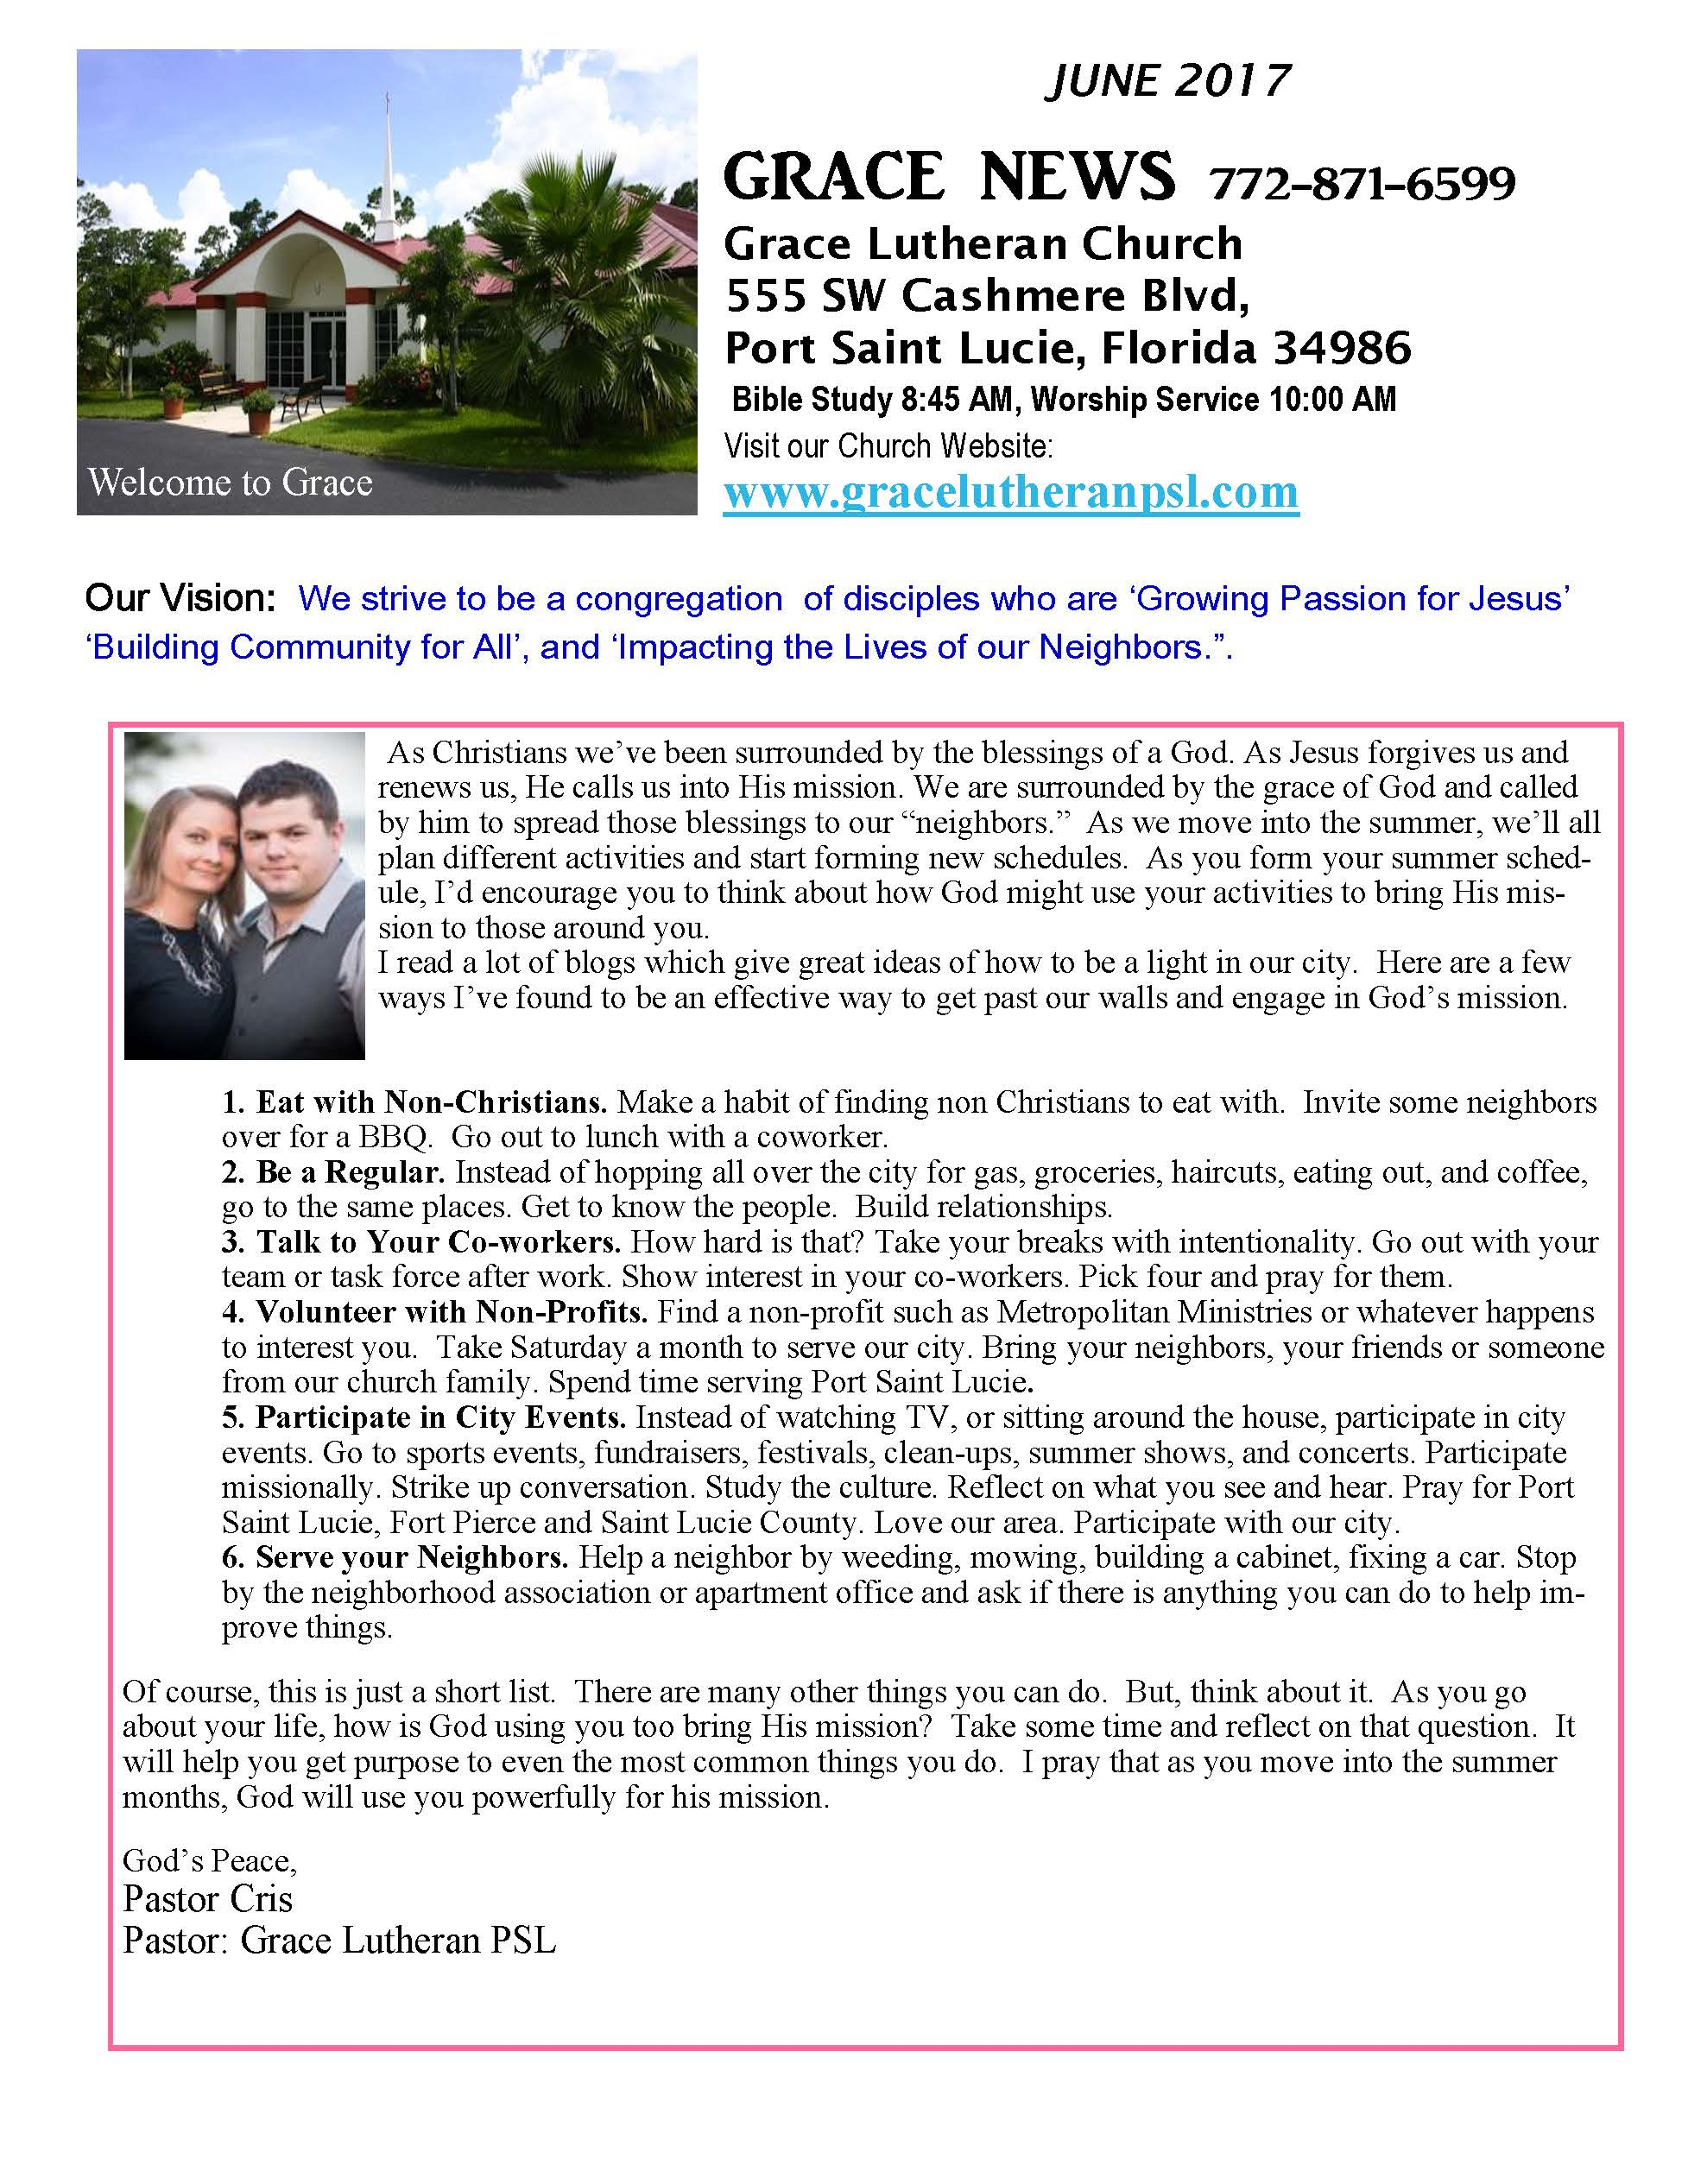 Grace News JUNE 2017_Page_1.jpg